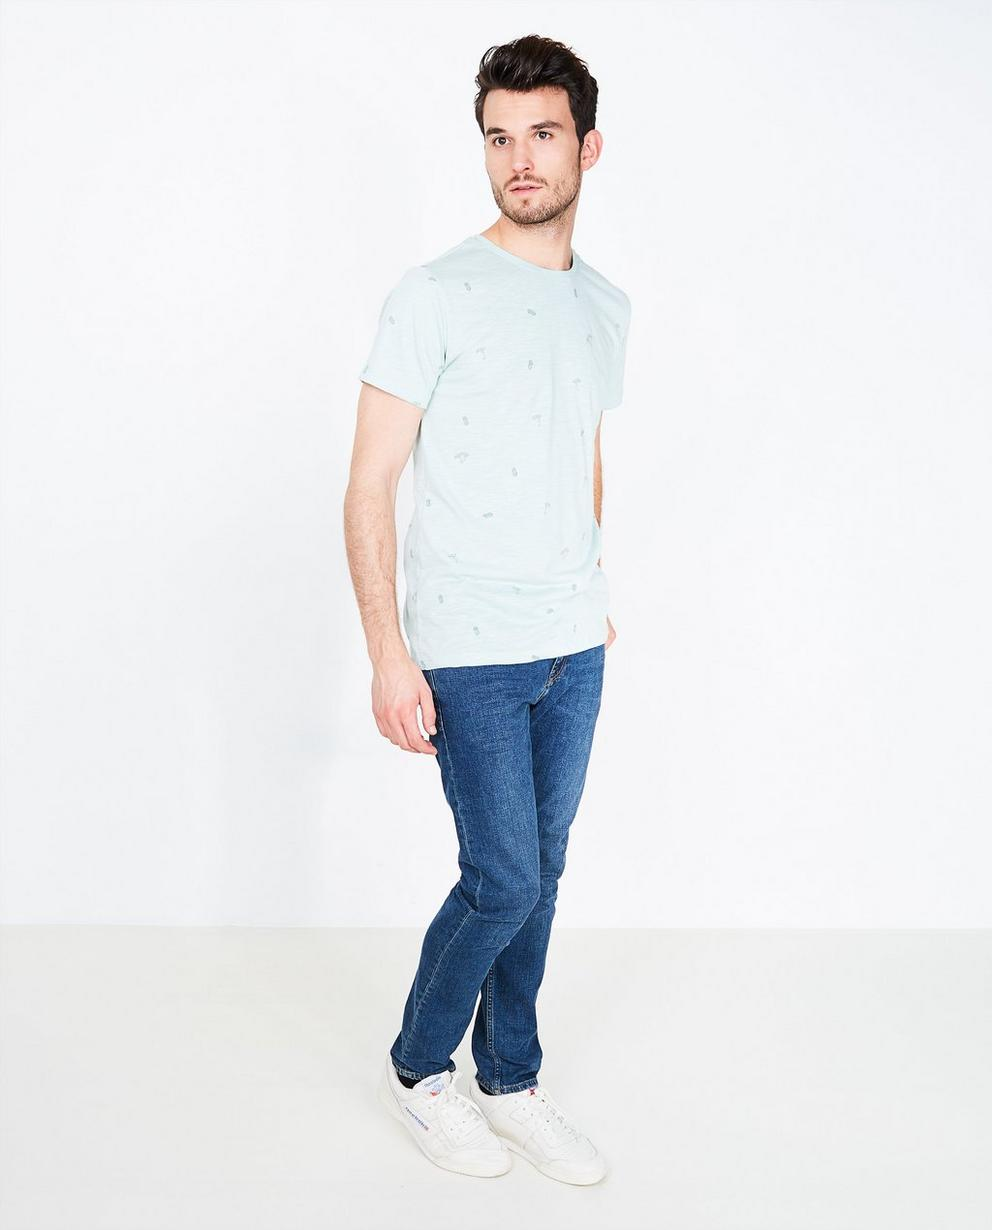 T-shirt met bananenprint - in donkergrijs - Quarterback